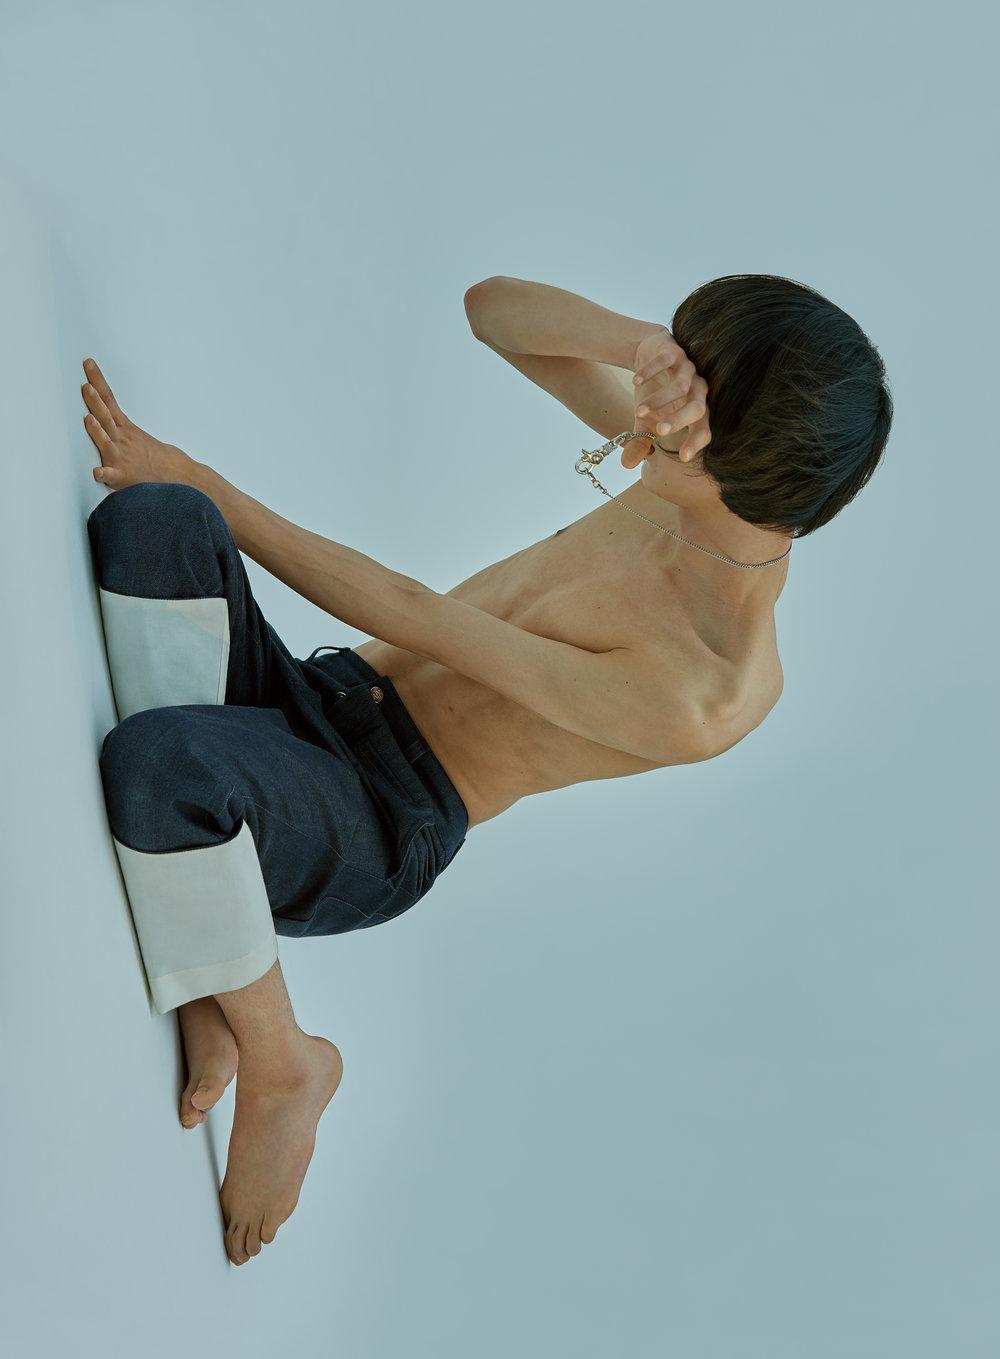 Denim Trousers: Loewe  Necklace: H.R